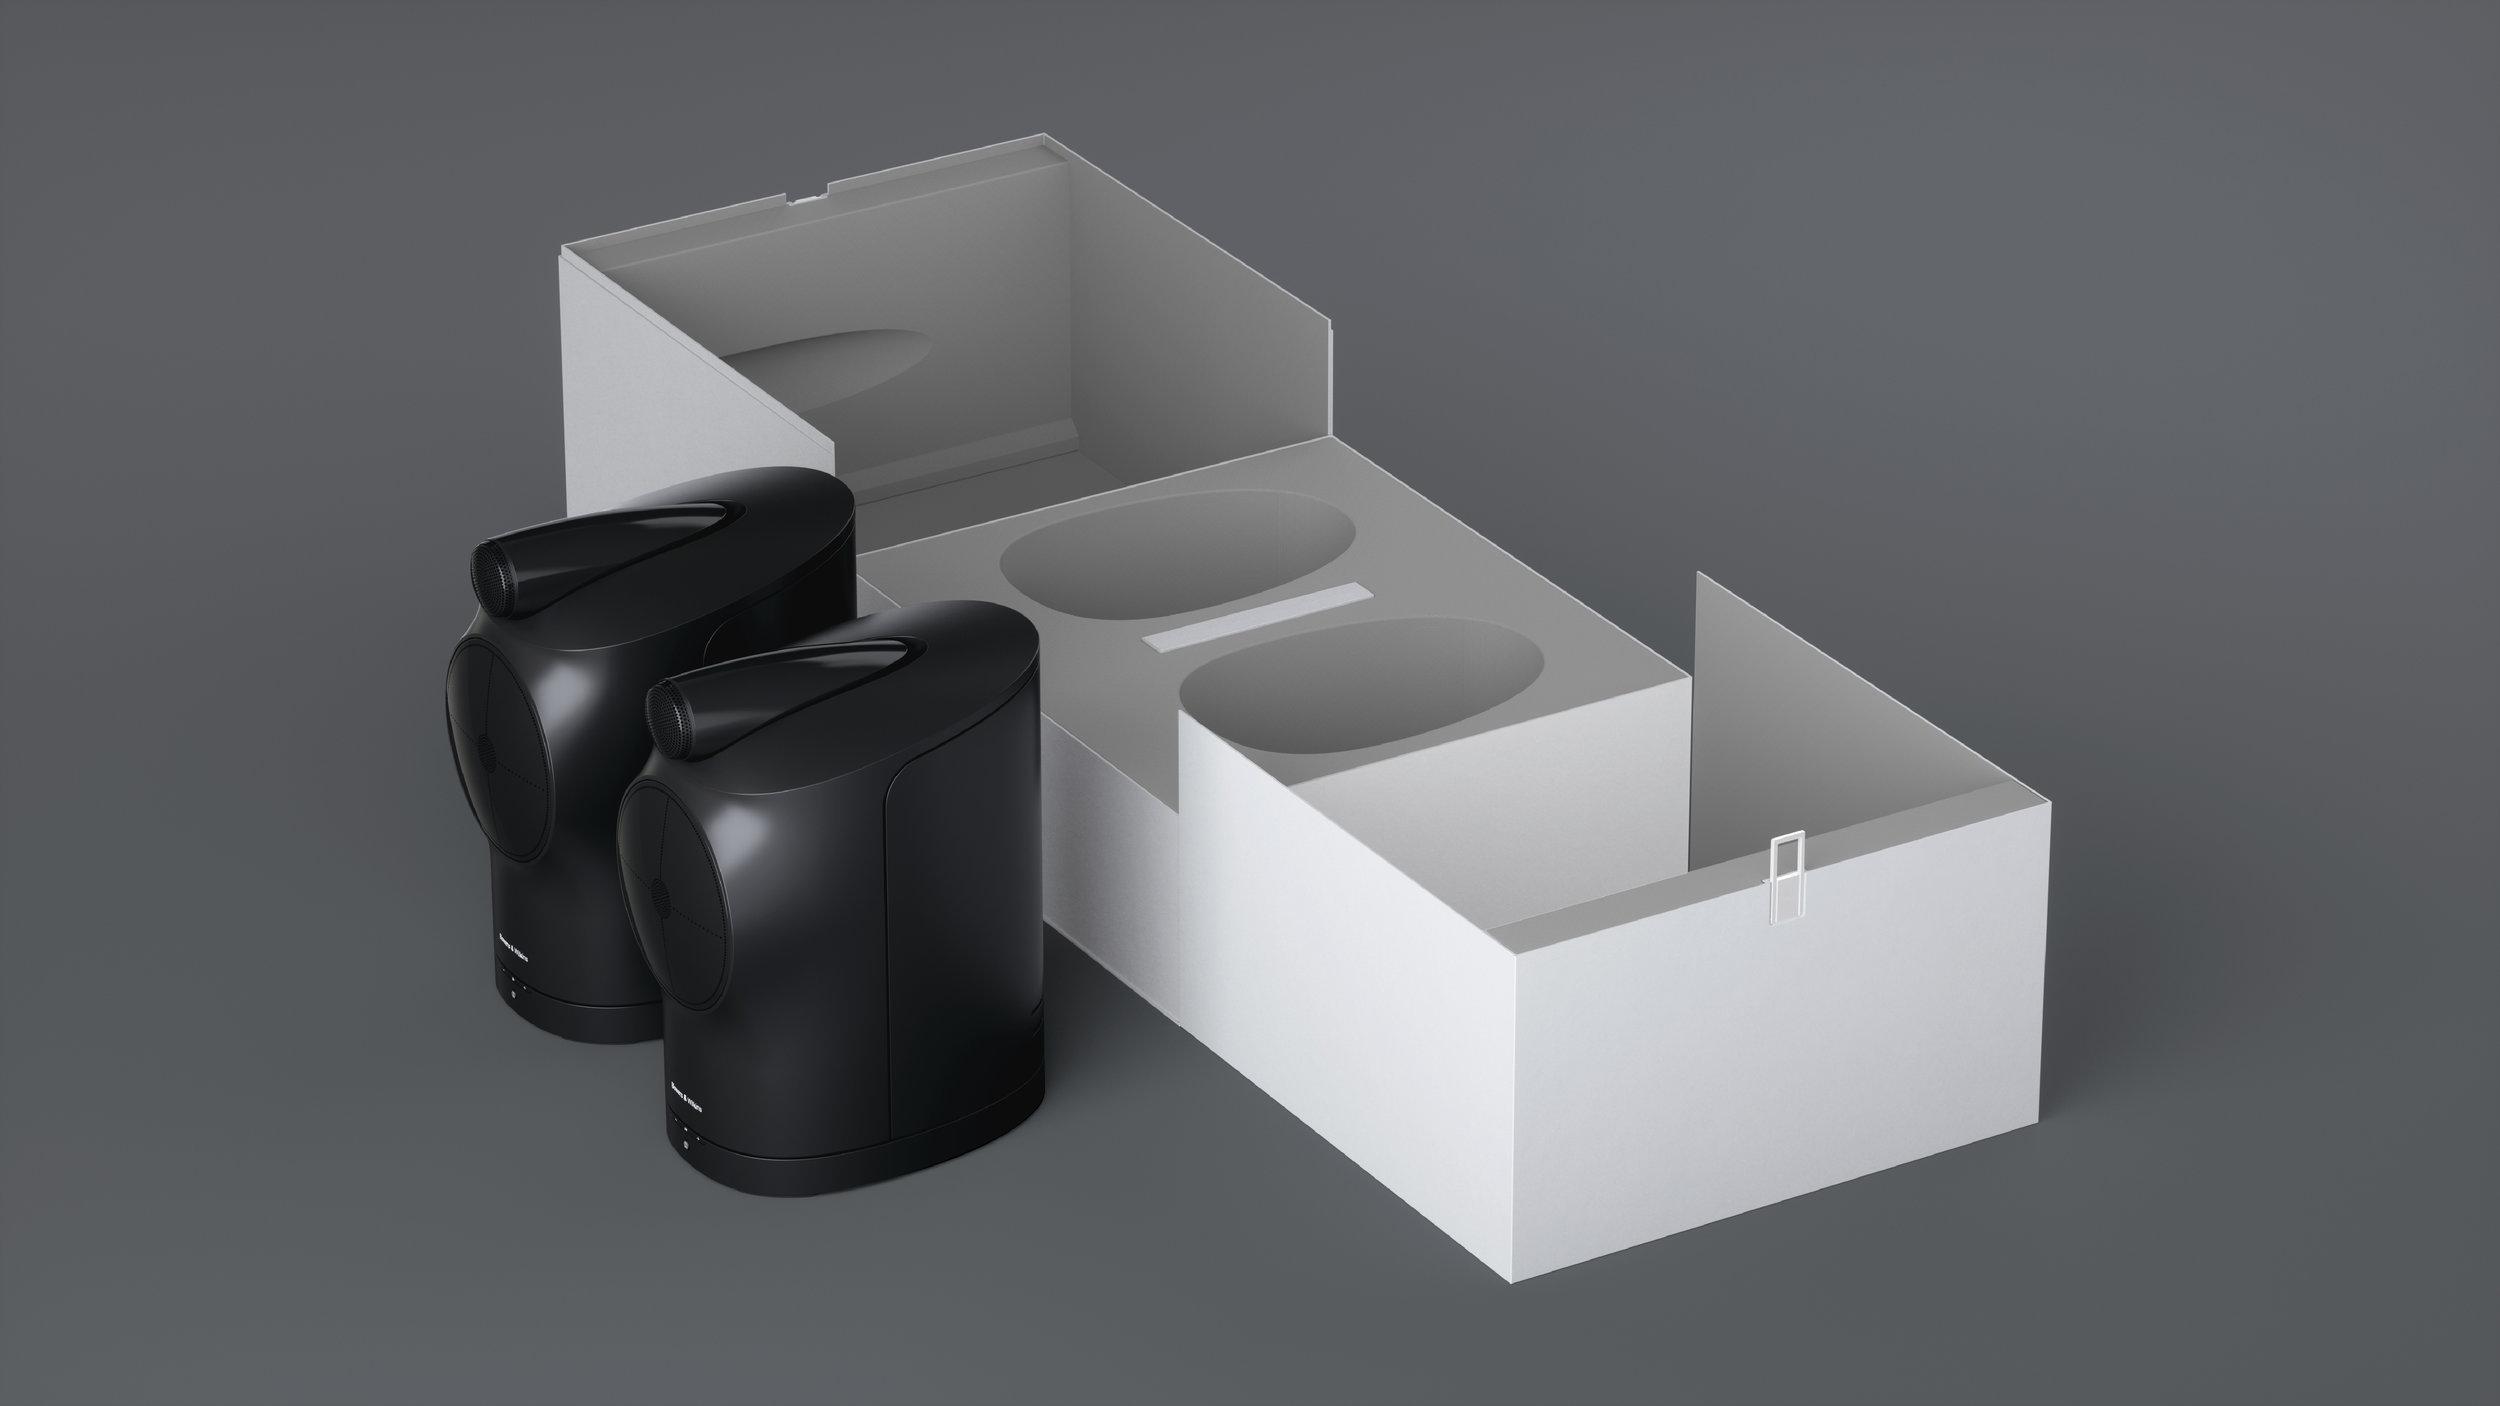 B&W_LibertySuite_PackagingStructure_R151.jpg